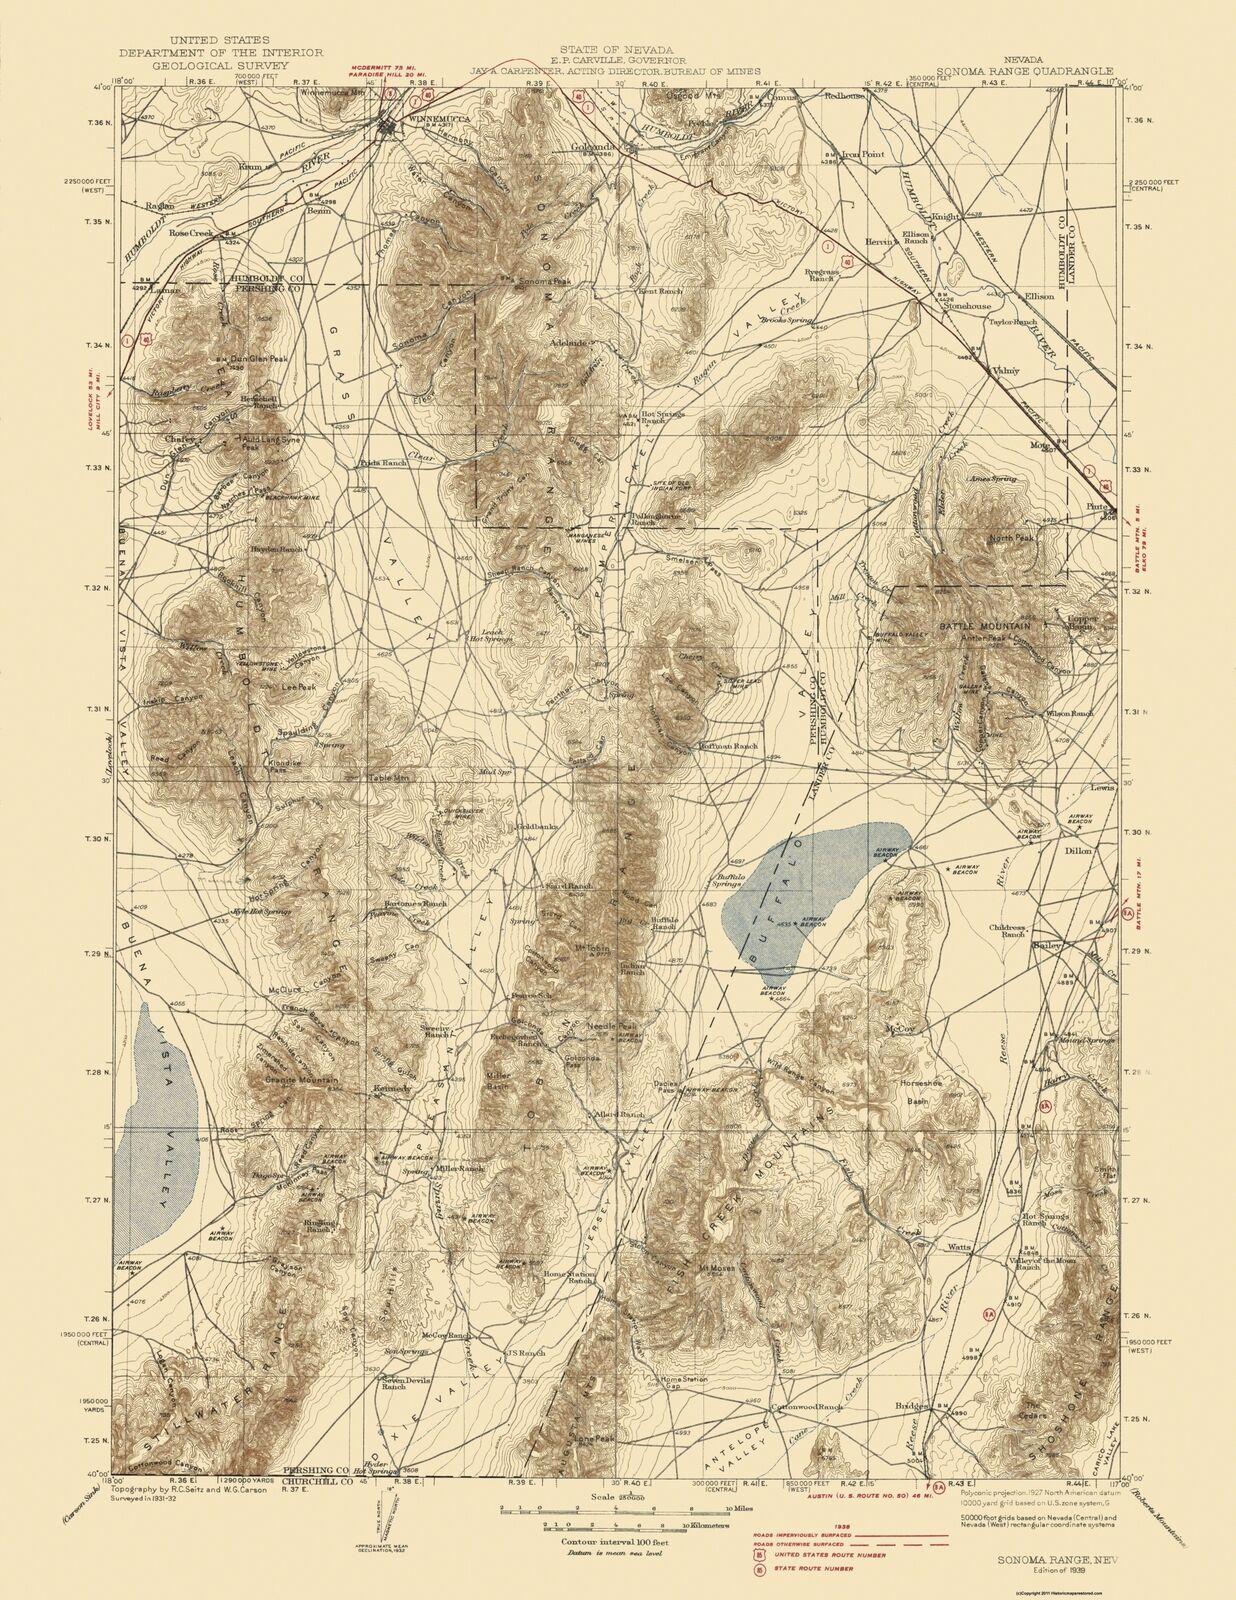 Topo Map - Sonoma Range Nevada Quad - USGS 1939 - 23 x 29.77 - $36.58 - $94.00